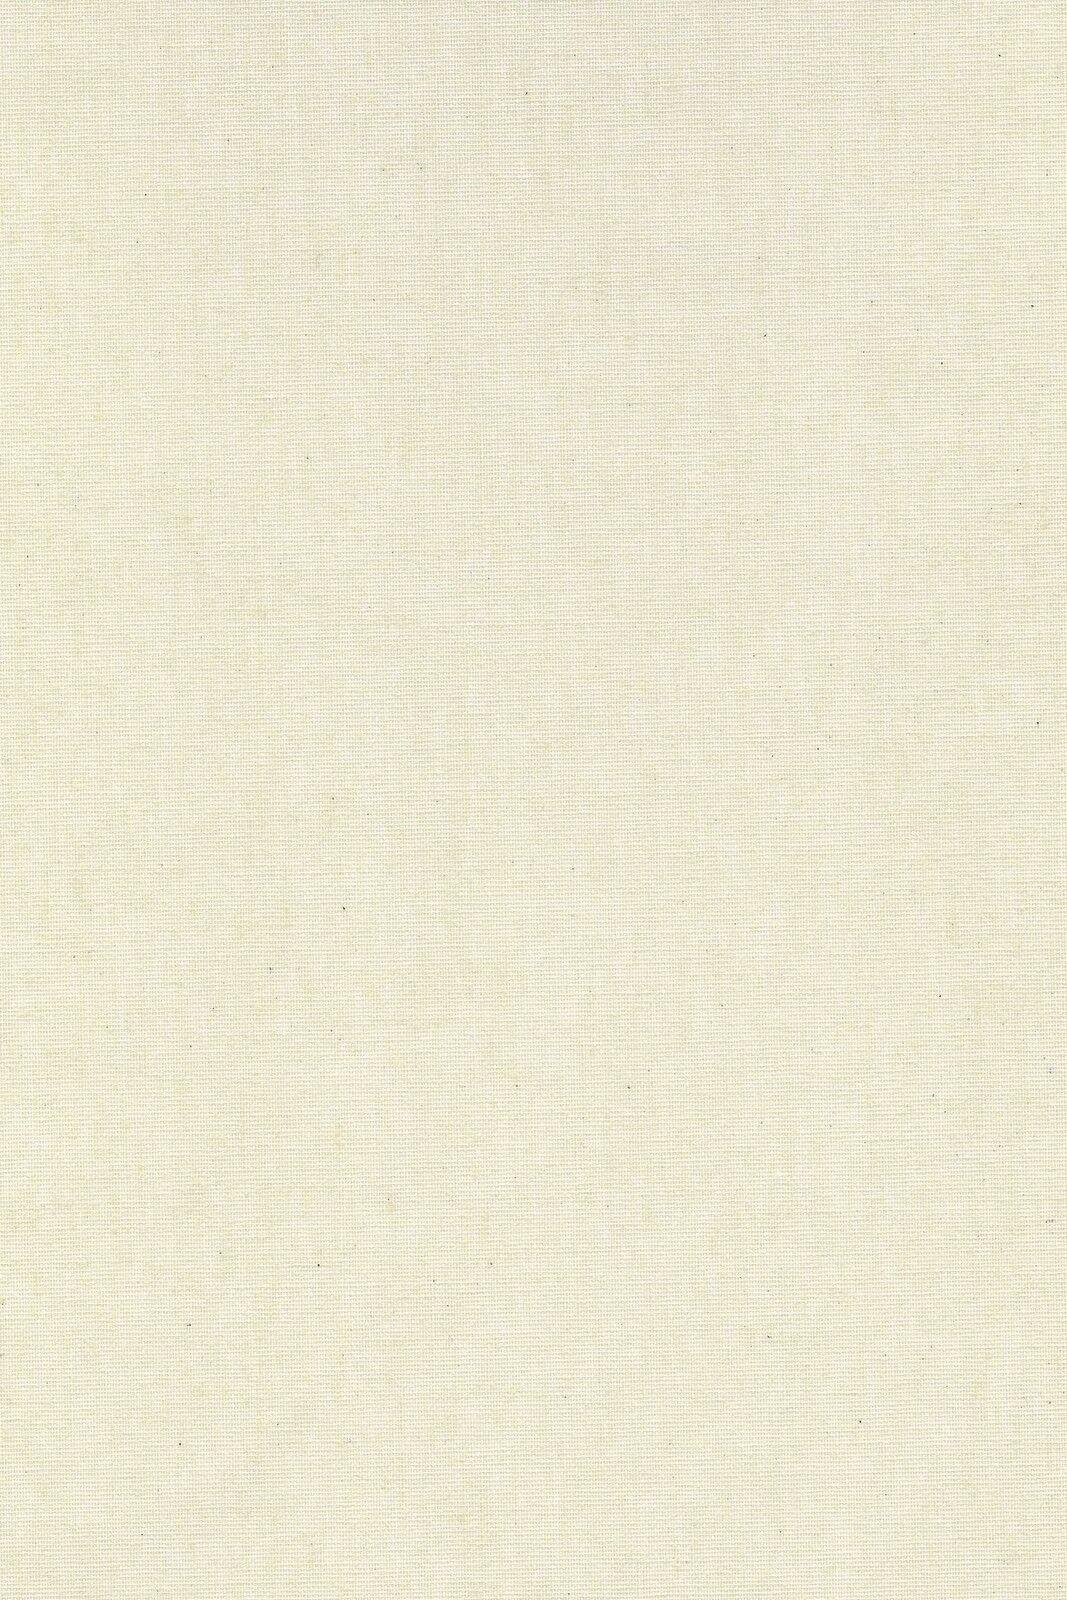 Springrollo Mittelzugrollo Mittelzugrollo Mittelzugrollo Schnapprollo Fenster Tür Rollo Mittelzug Natur | Authentische Garantie  85ed4d